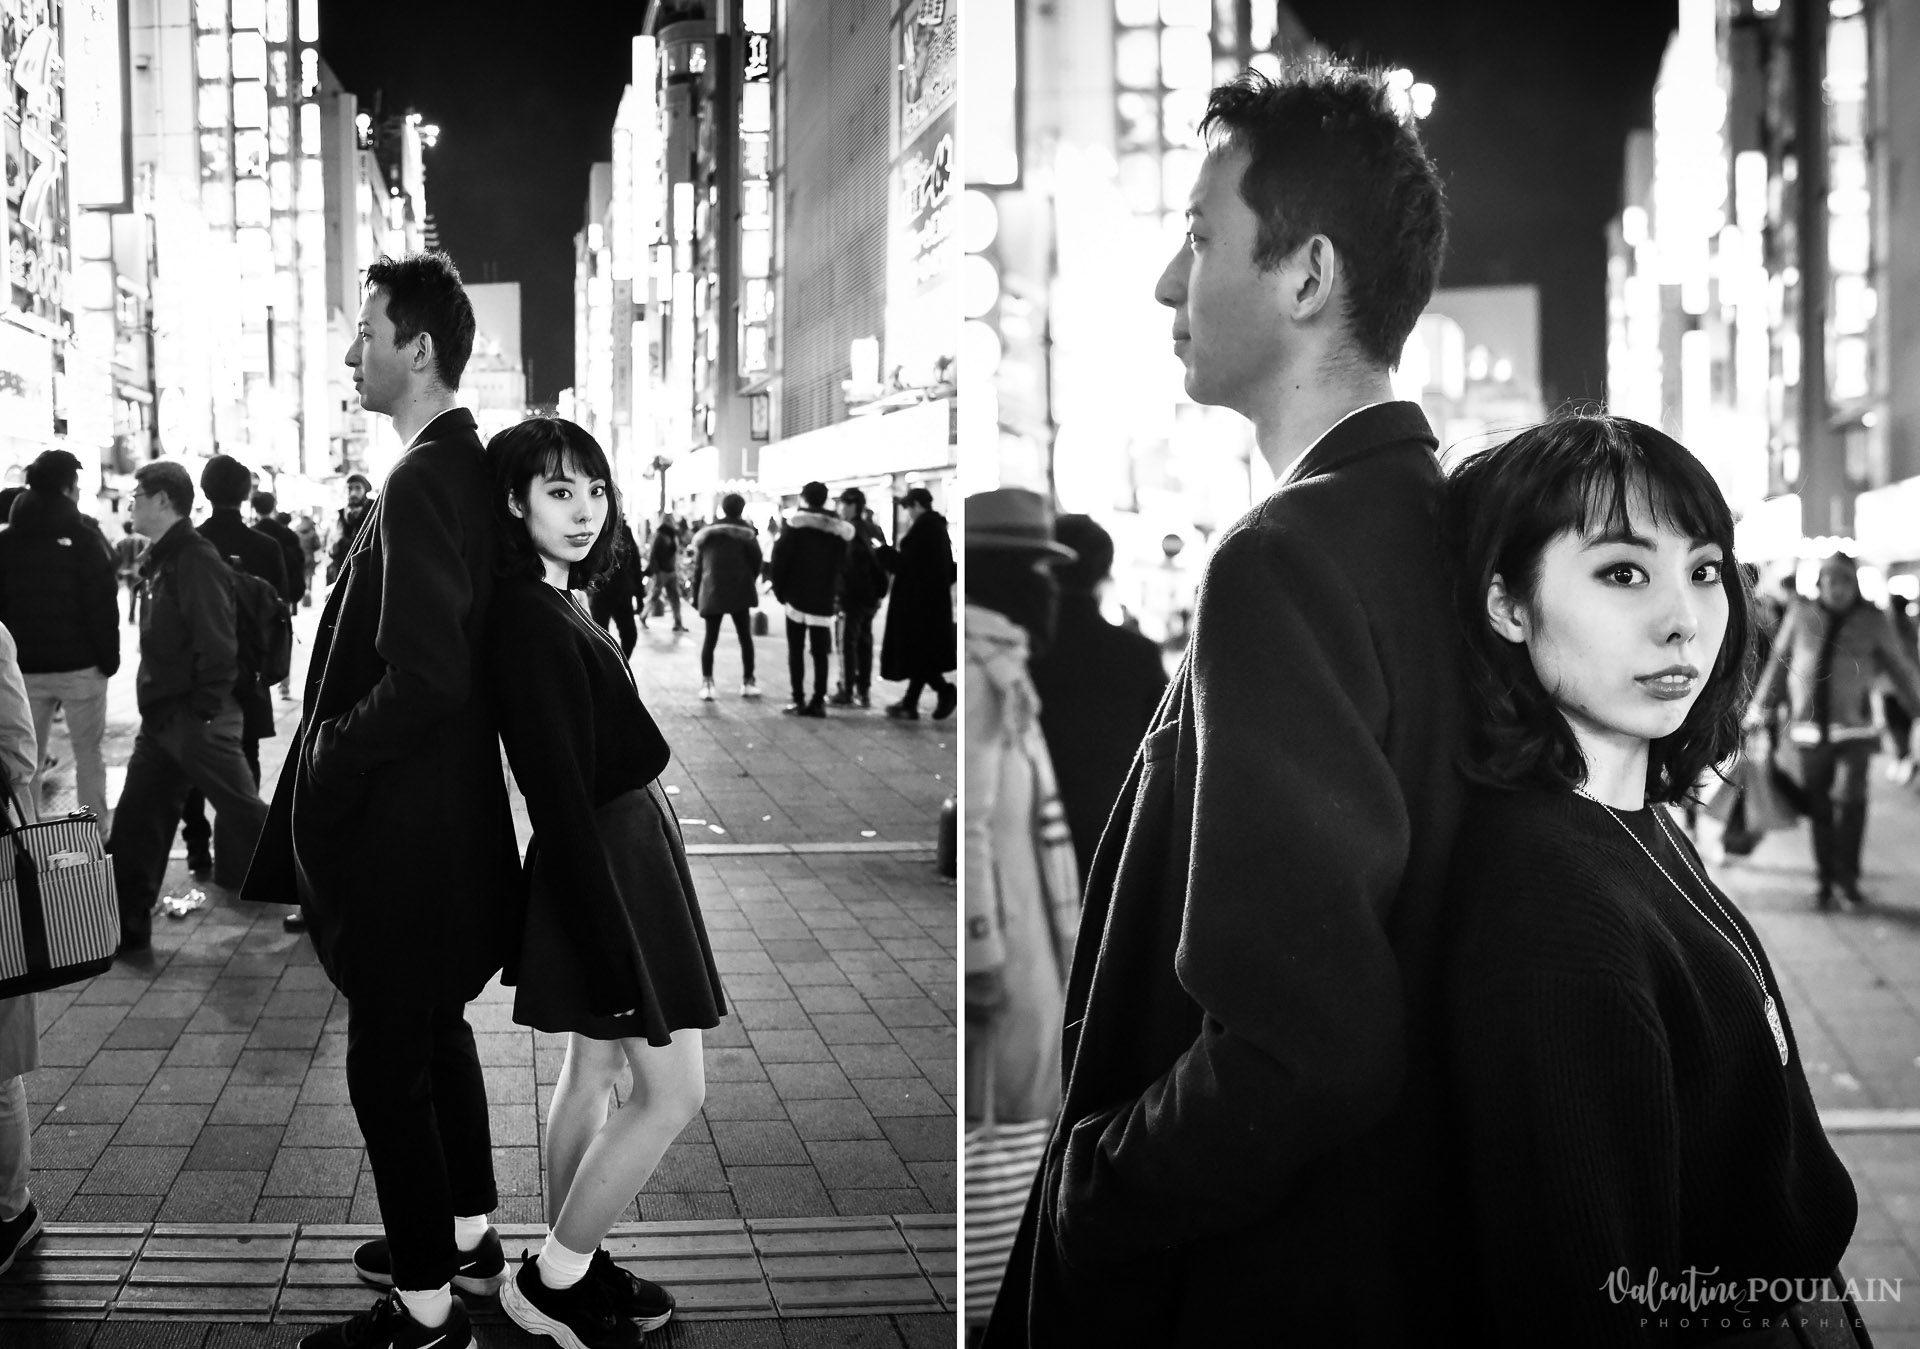 Shooting couple Japon Tokyo Valentine Poulain n&b